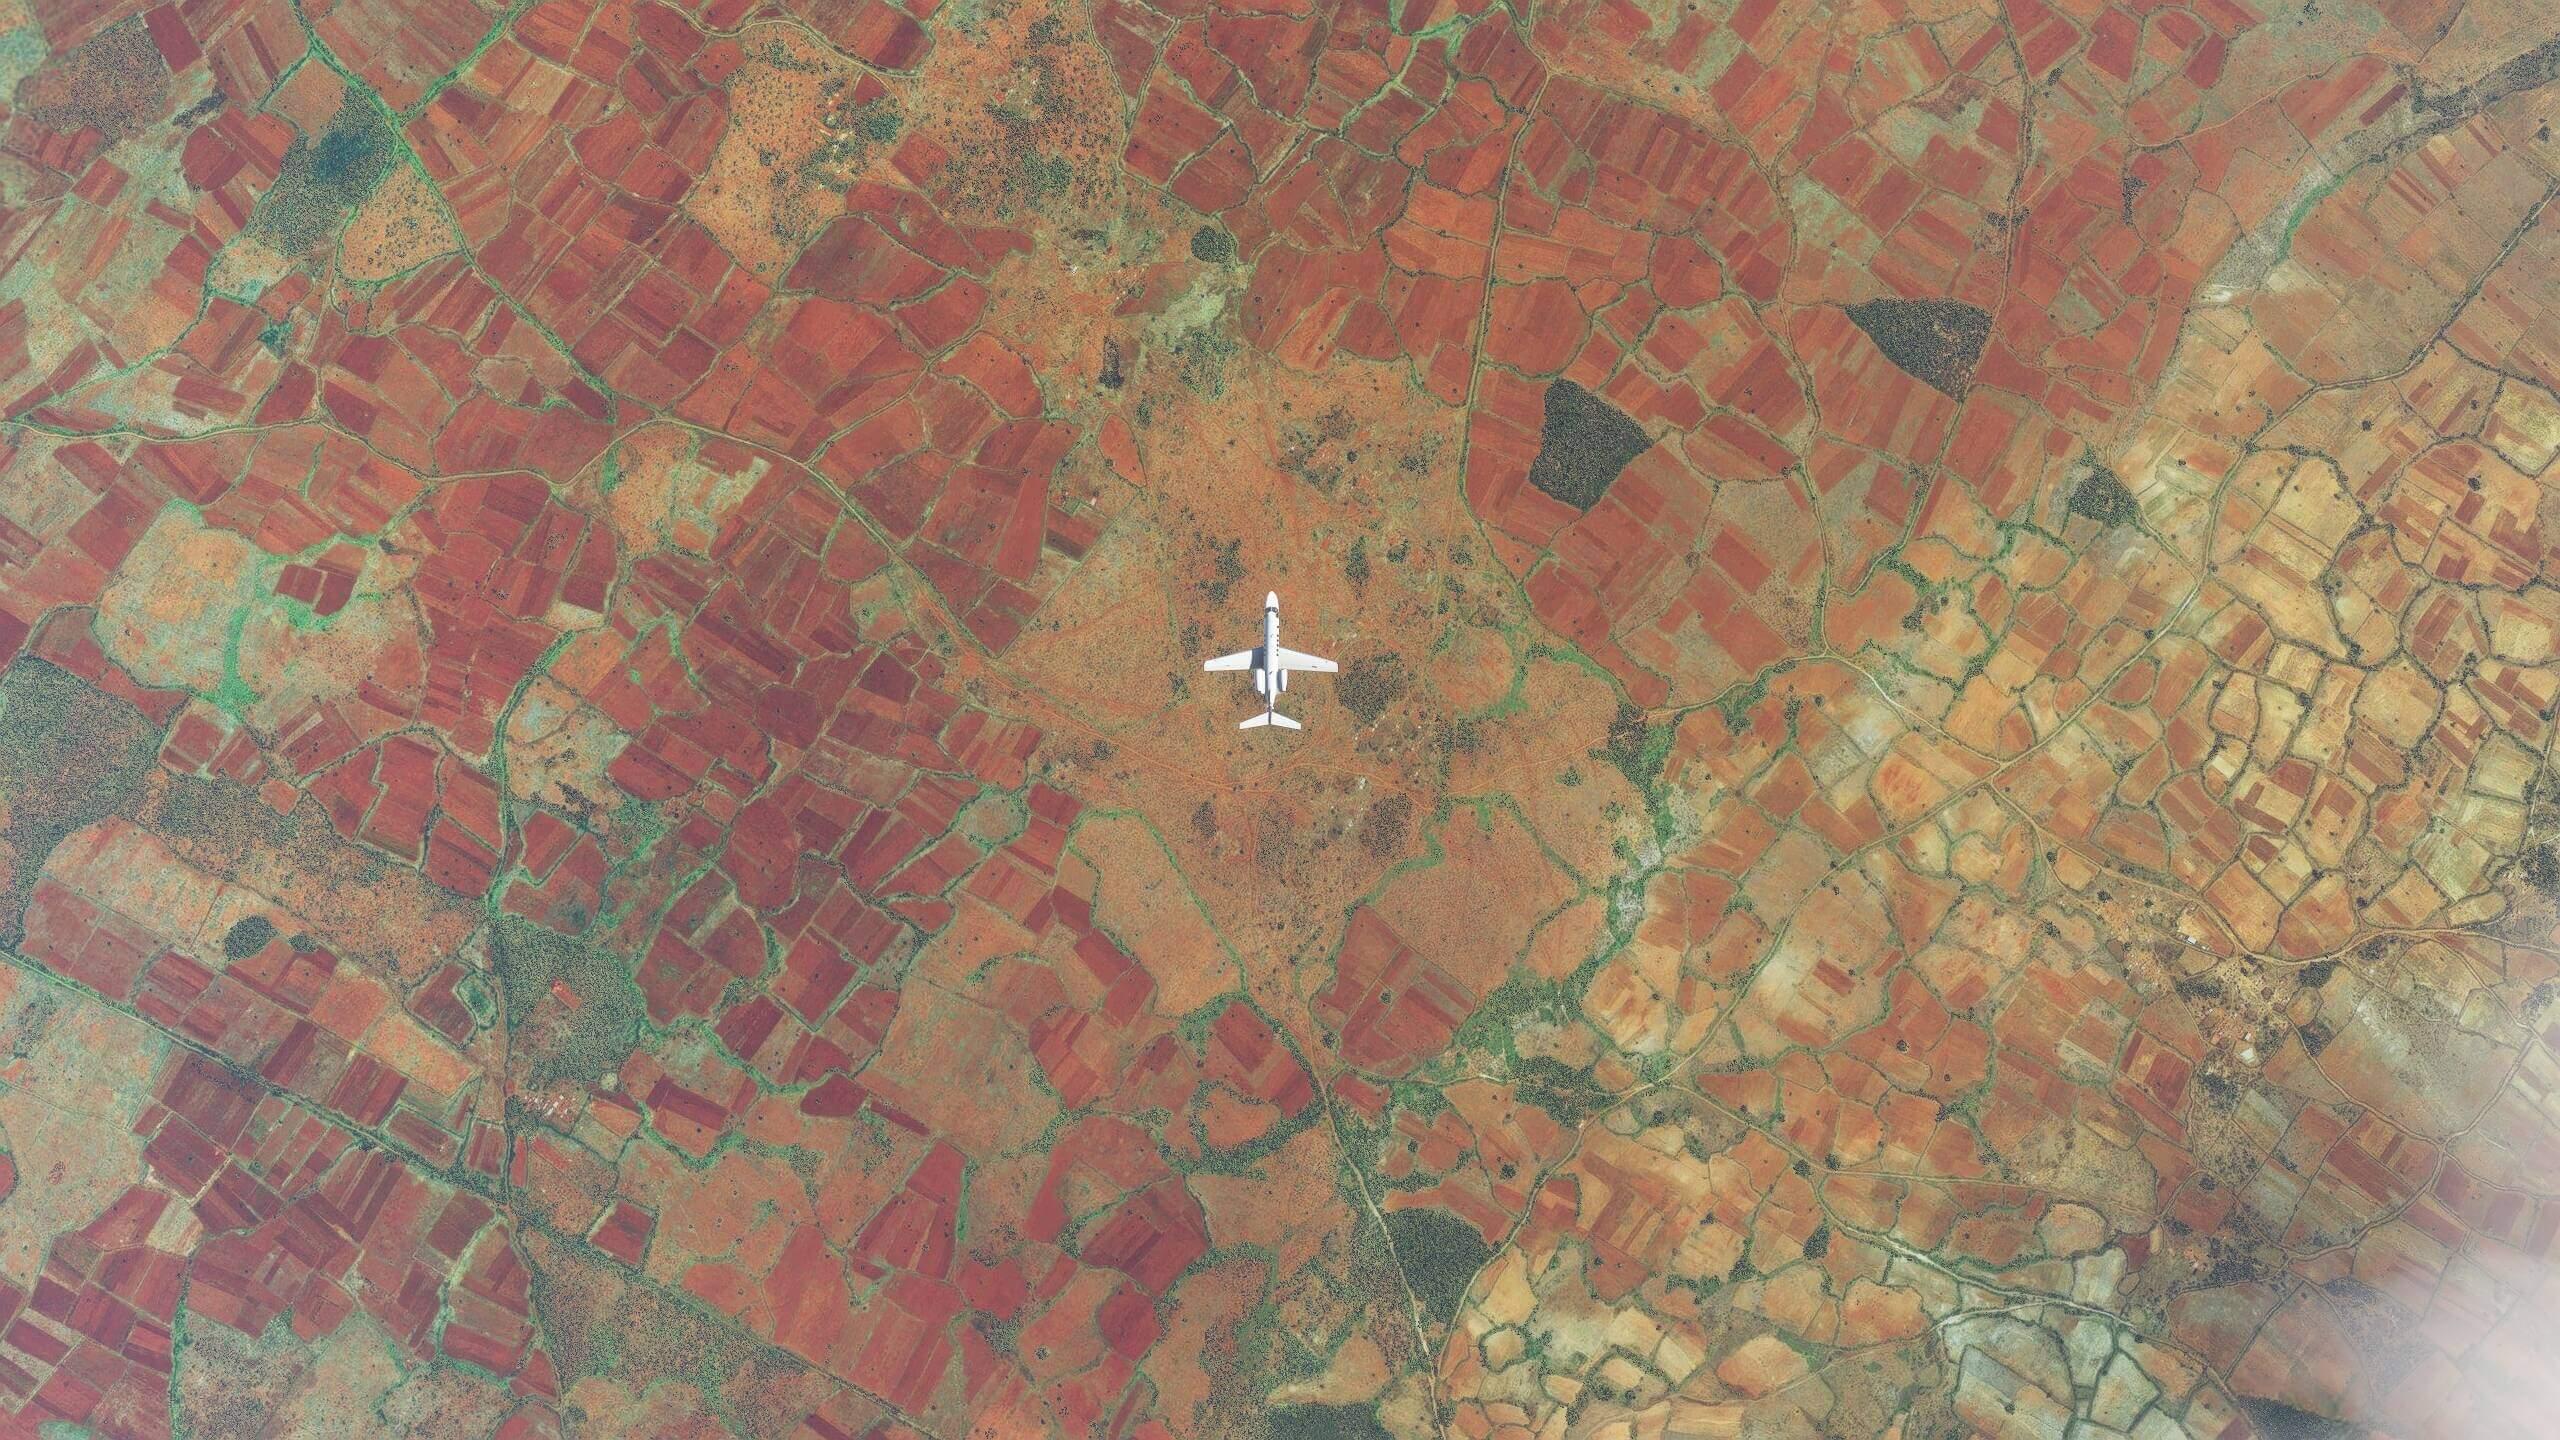 Plane flying over Madagascar